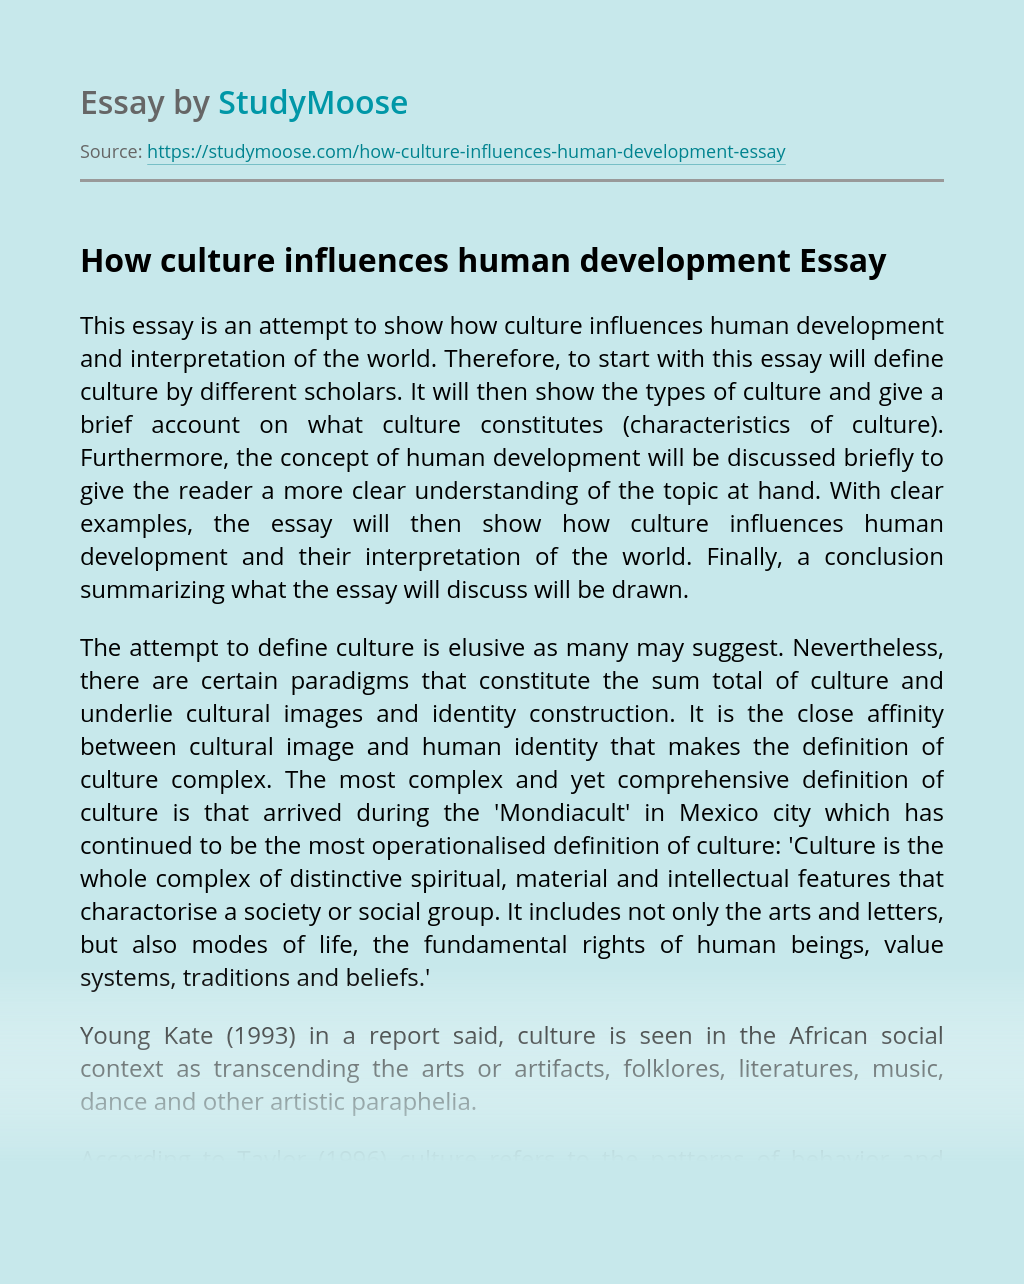 How culture influences human development